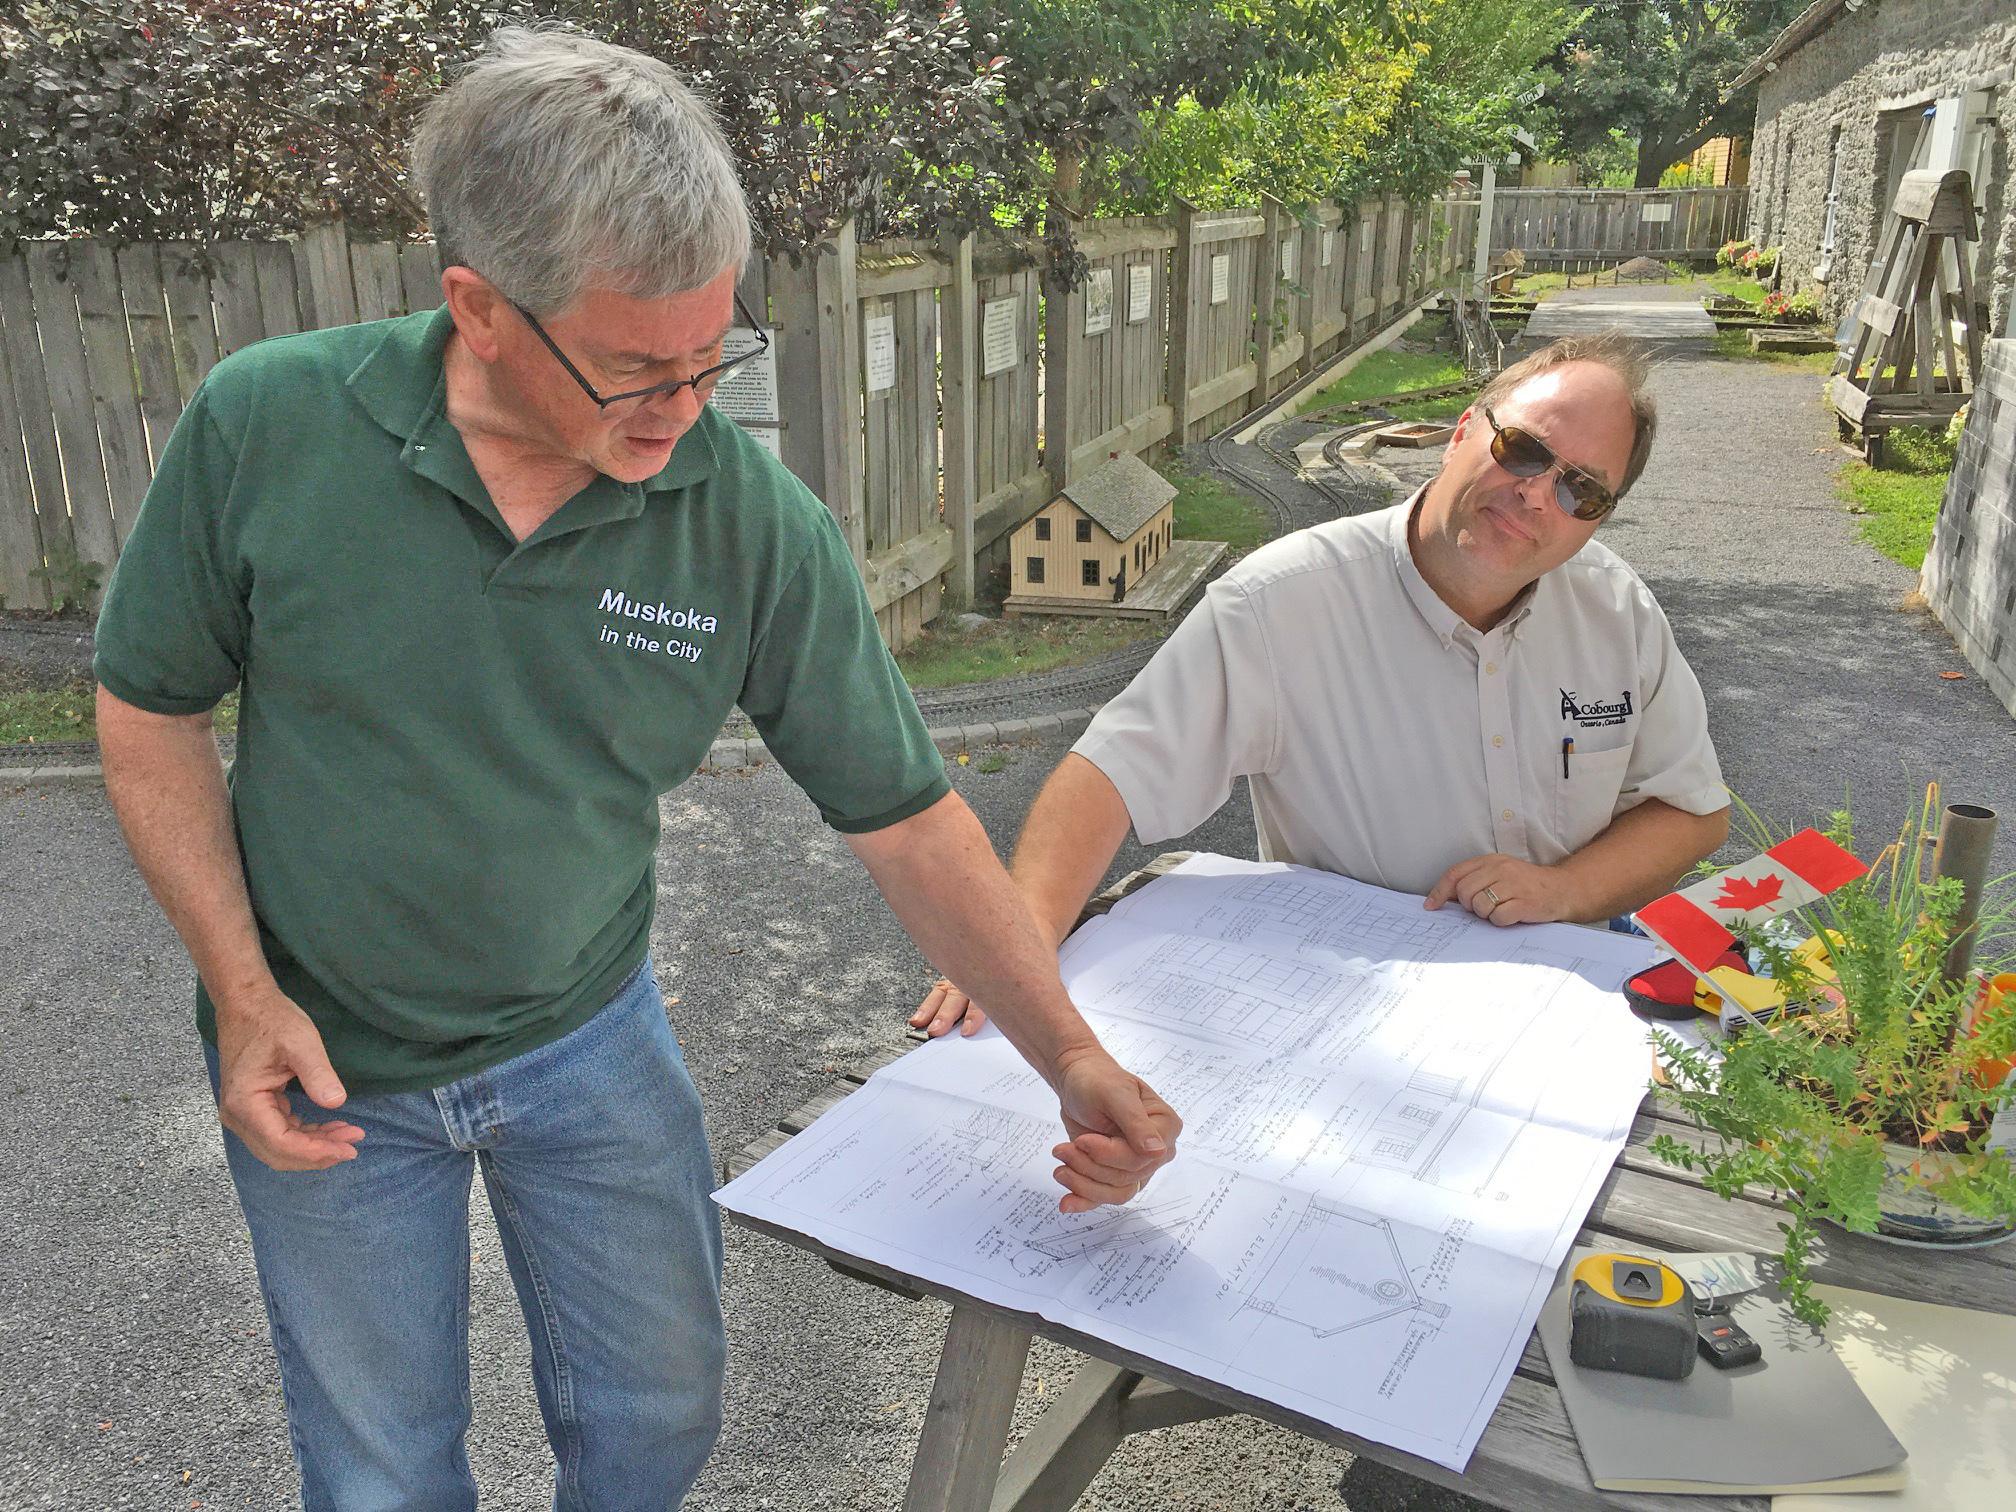 Al Seymour consults with Rob Franklin